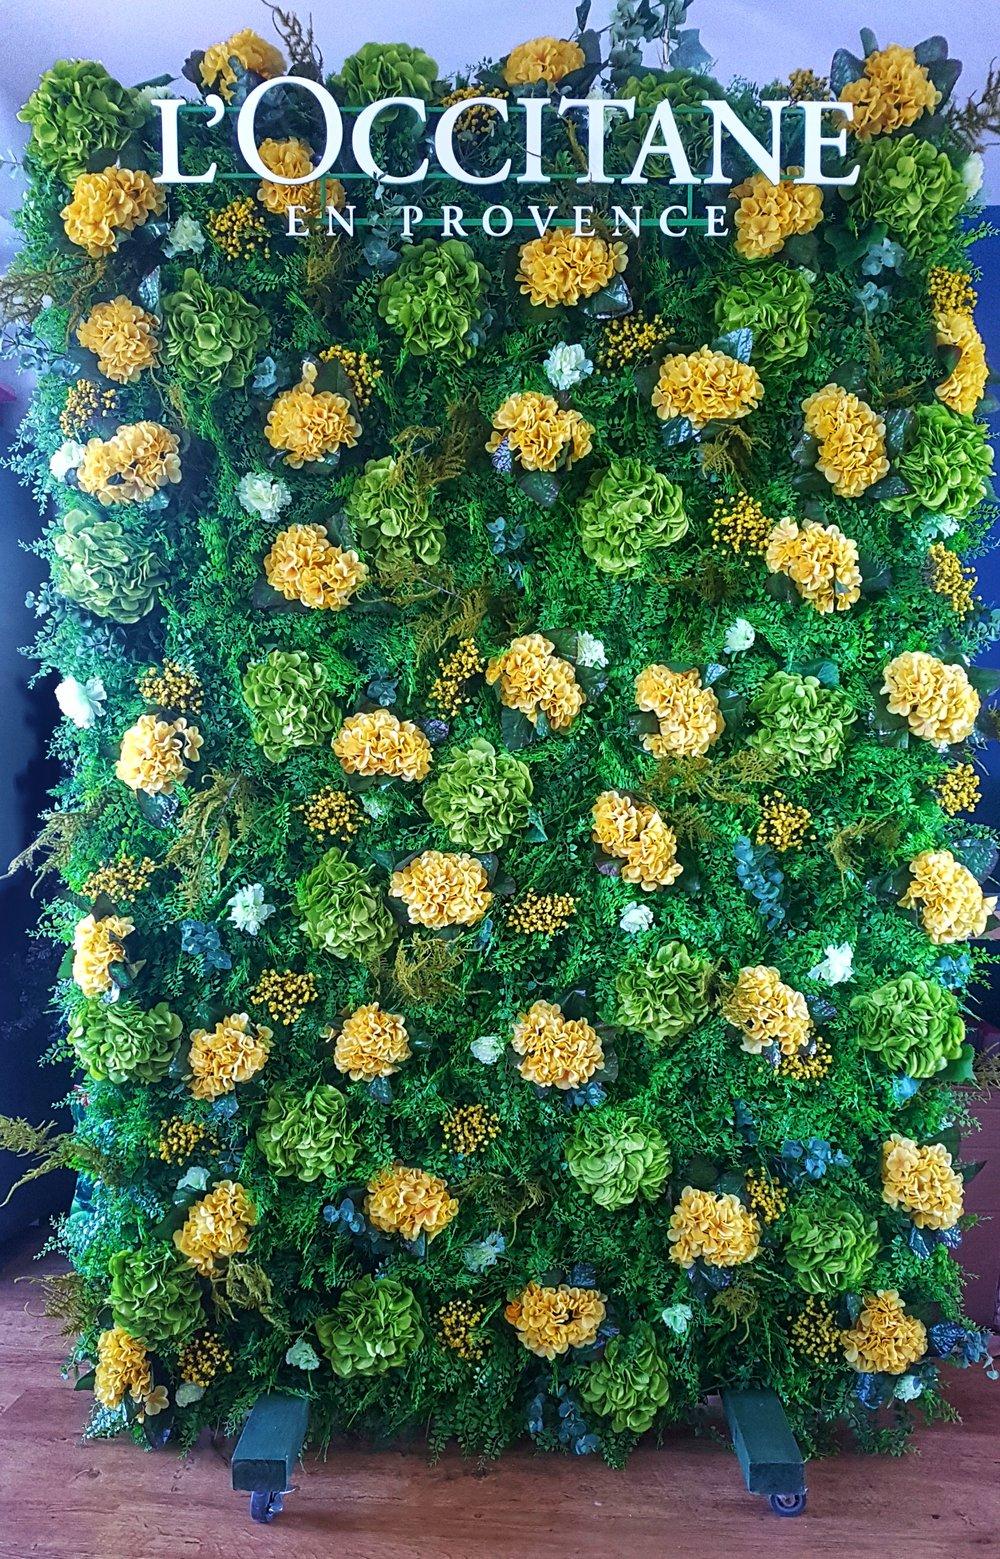 L'Occitane bespoke flower wall.jpeg